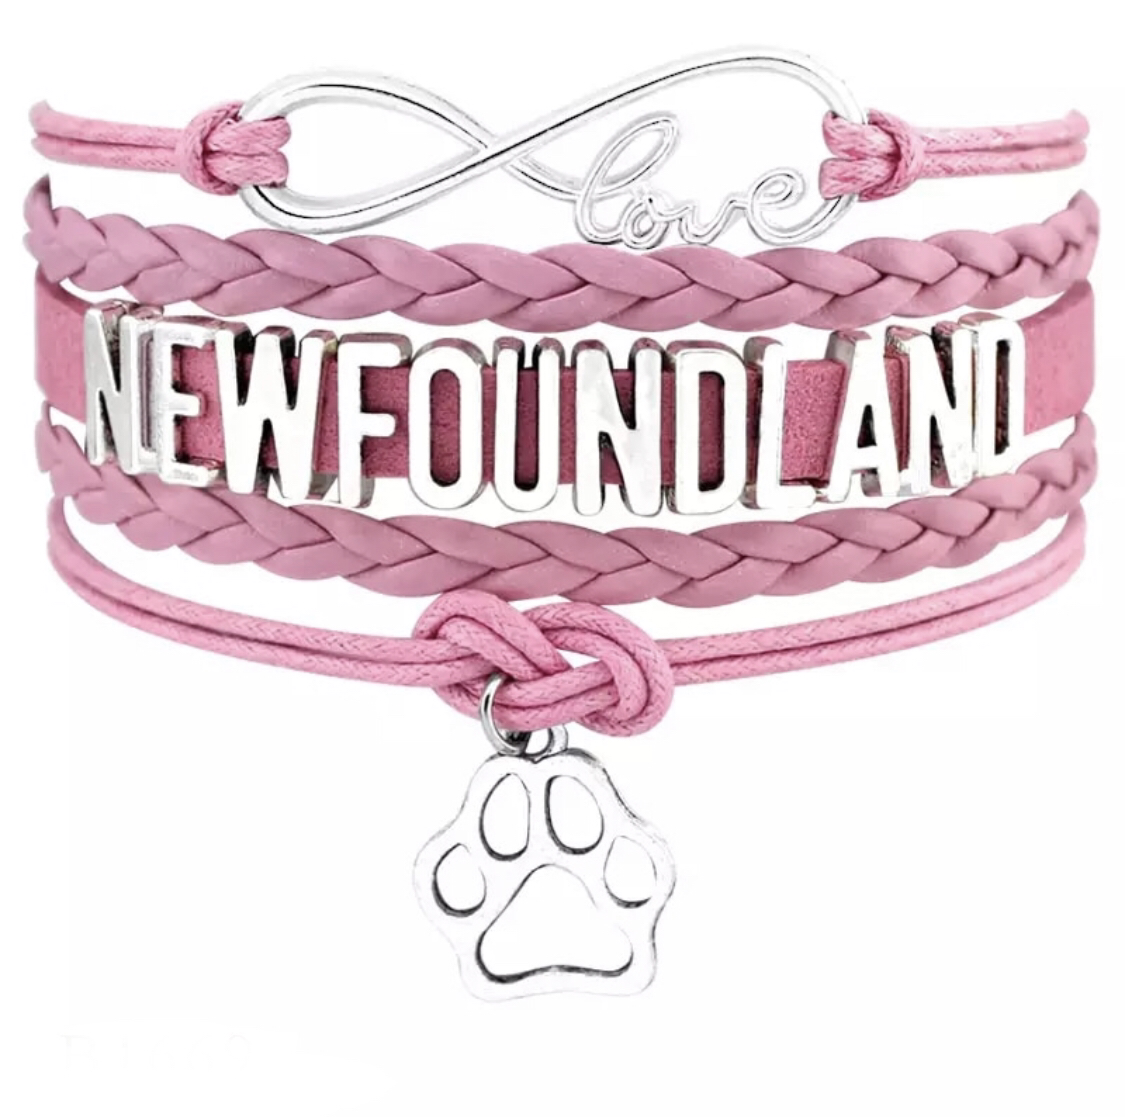 Újfoundlandi - PINK